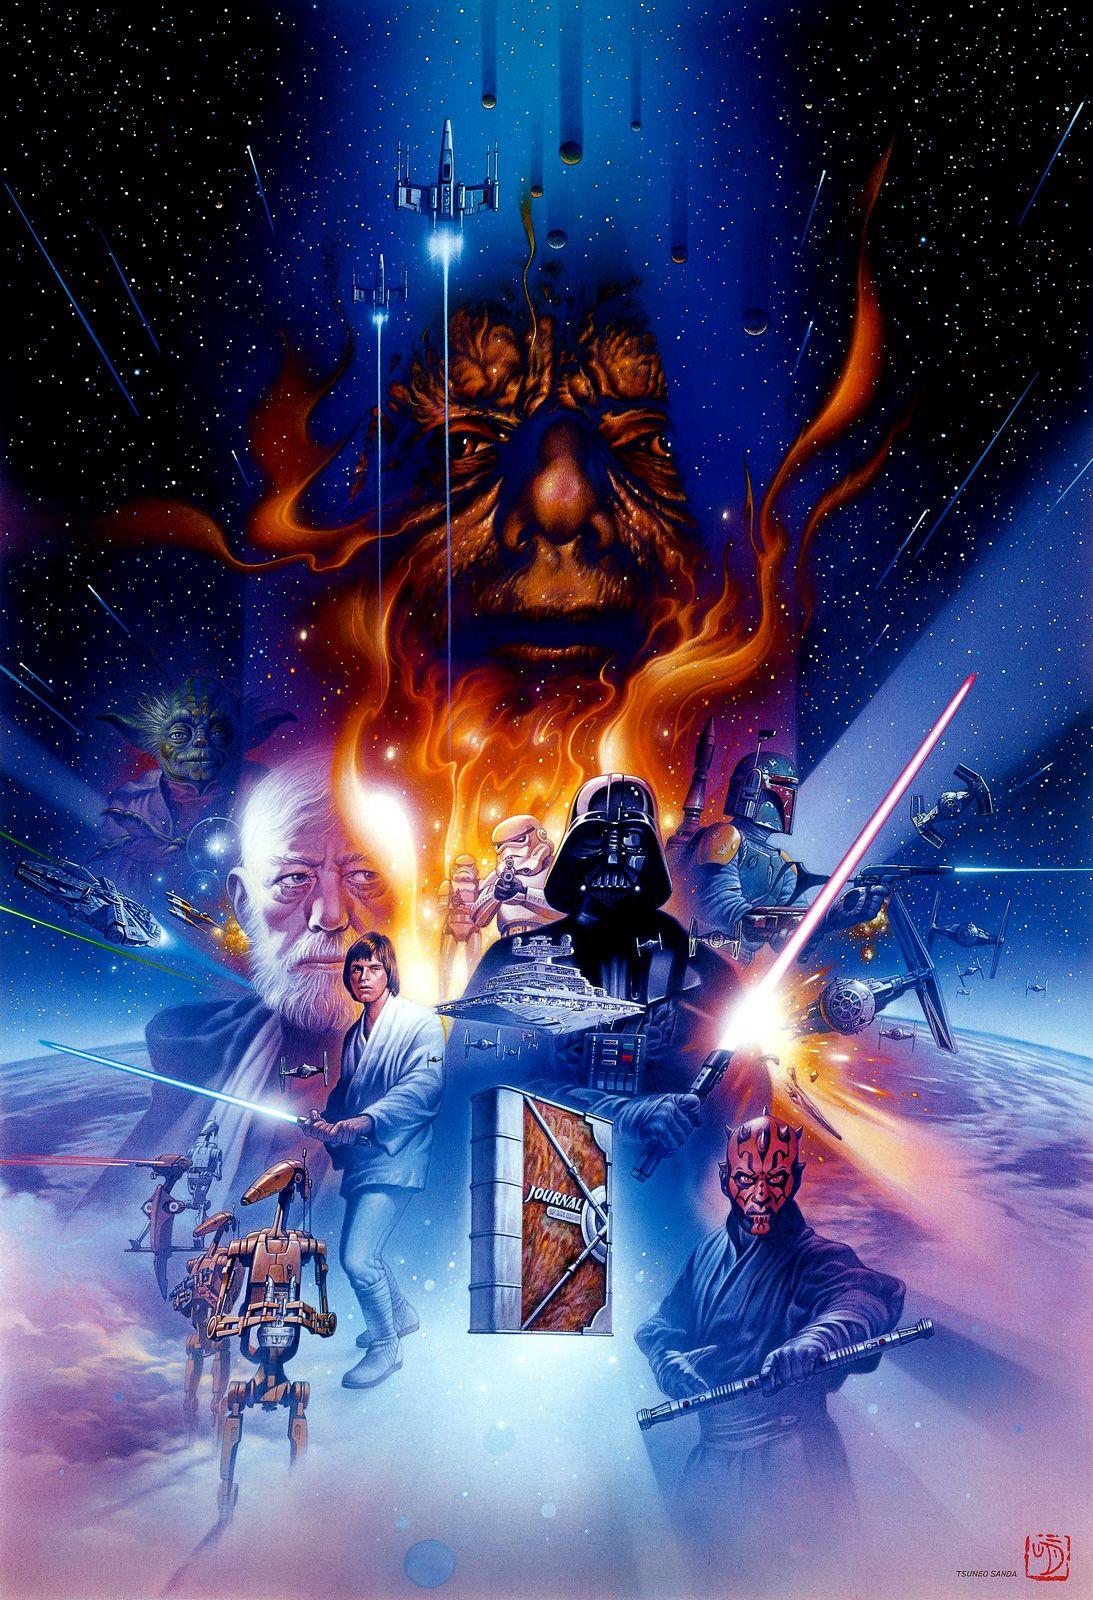 Darth Vader Star Wars Original Art Sandaworld Com The Art Of Tsuneo Sanda Star Wars Original Art Star Wars Images Star Wars Artwork